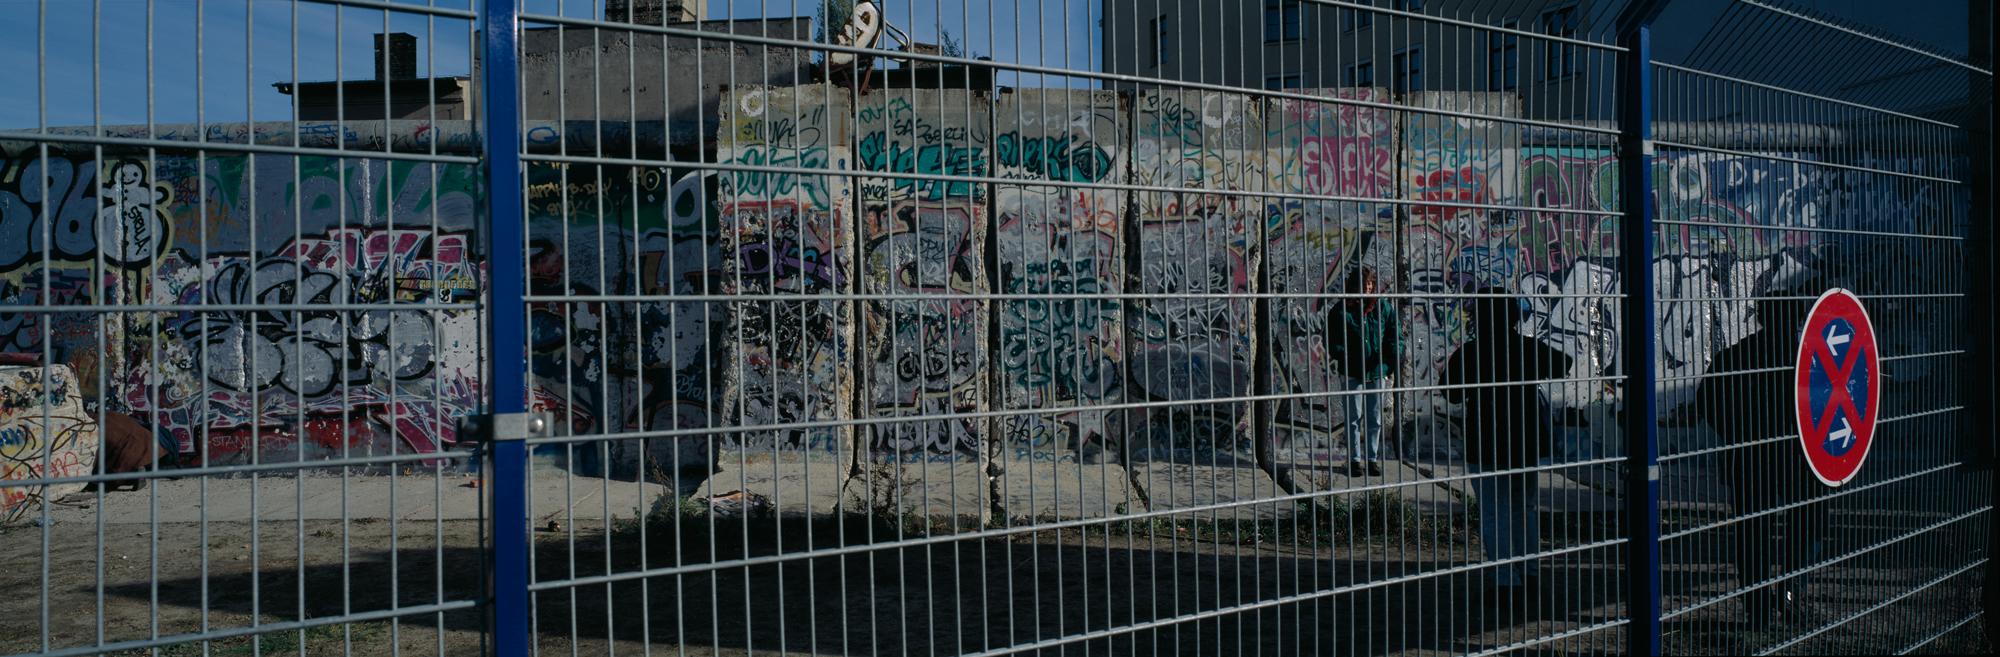 large format photography, Grossformatfotografie, Grossformatphotographie, Fotografie, Photographie, photography, 6x17, Berlin, Hauptstadt, capitol, city, Stadt, Architektur, architecture, Beton, Stahl, concrete, steel, Berliner Mauer, Berlin Wall